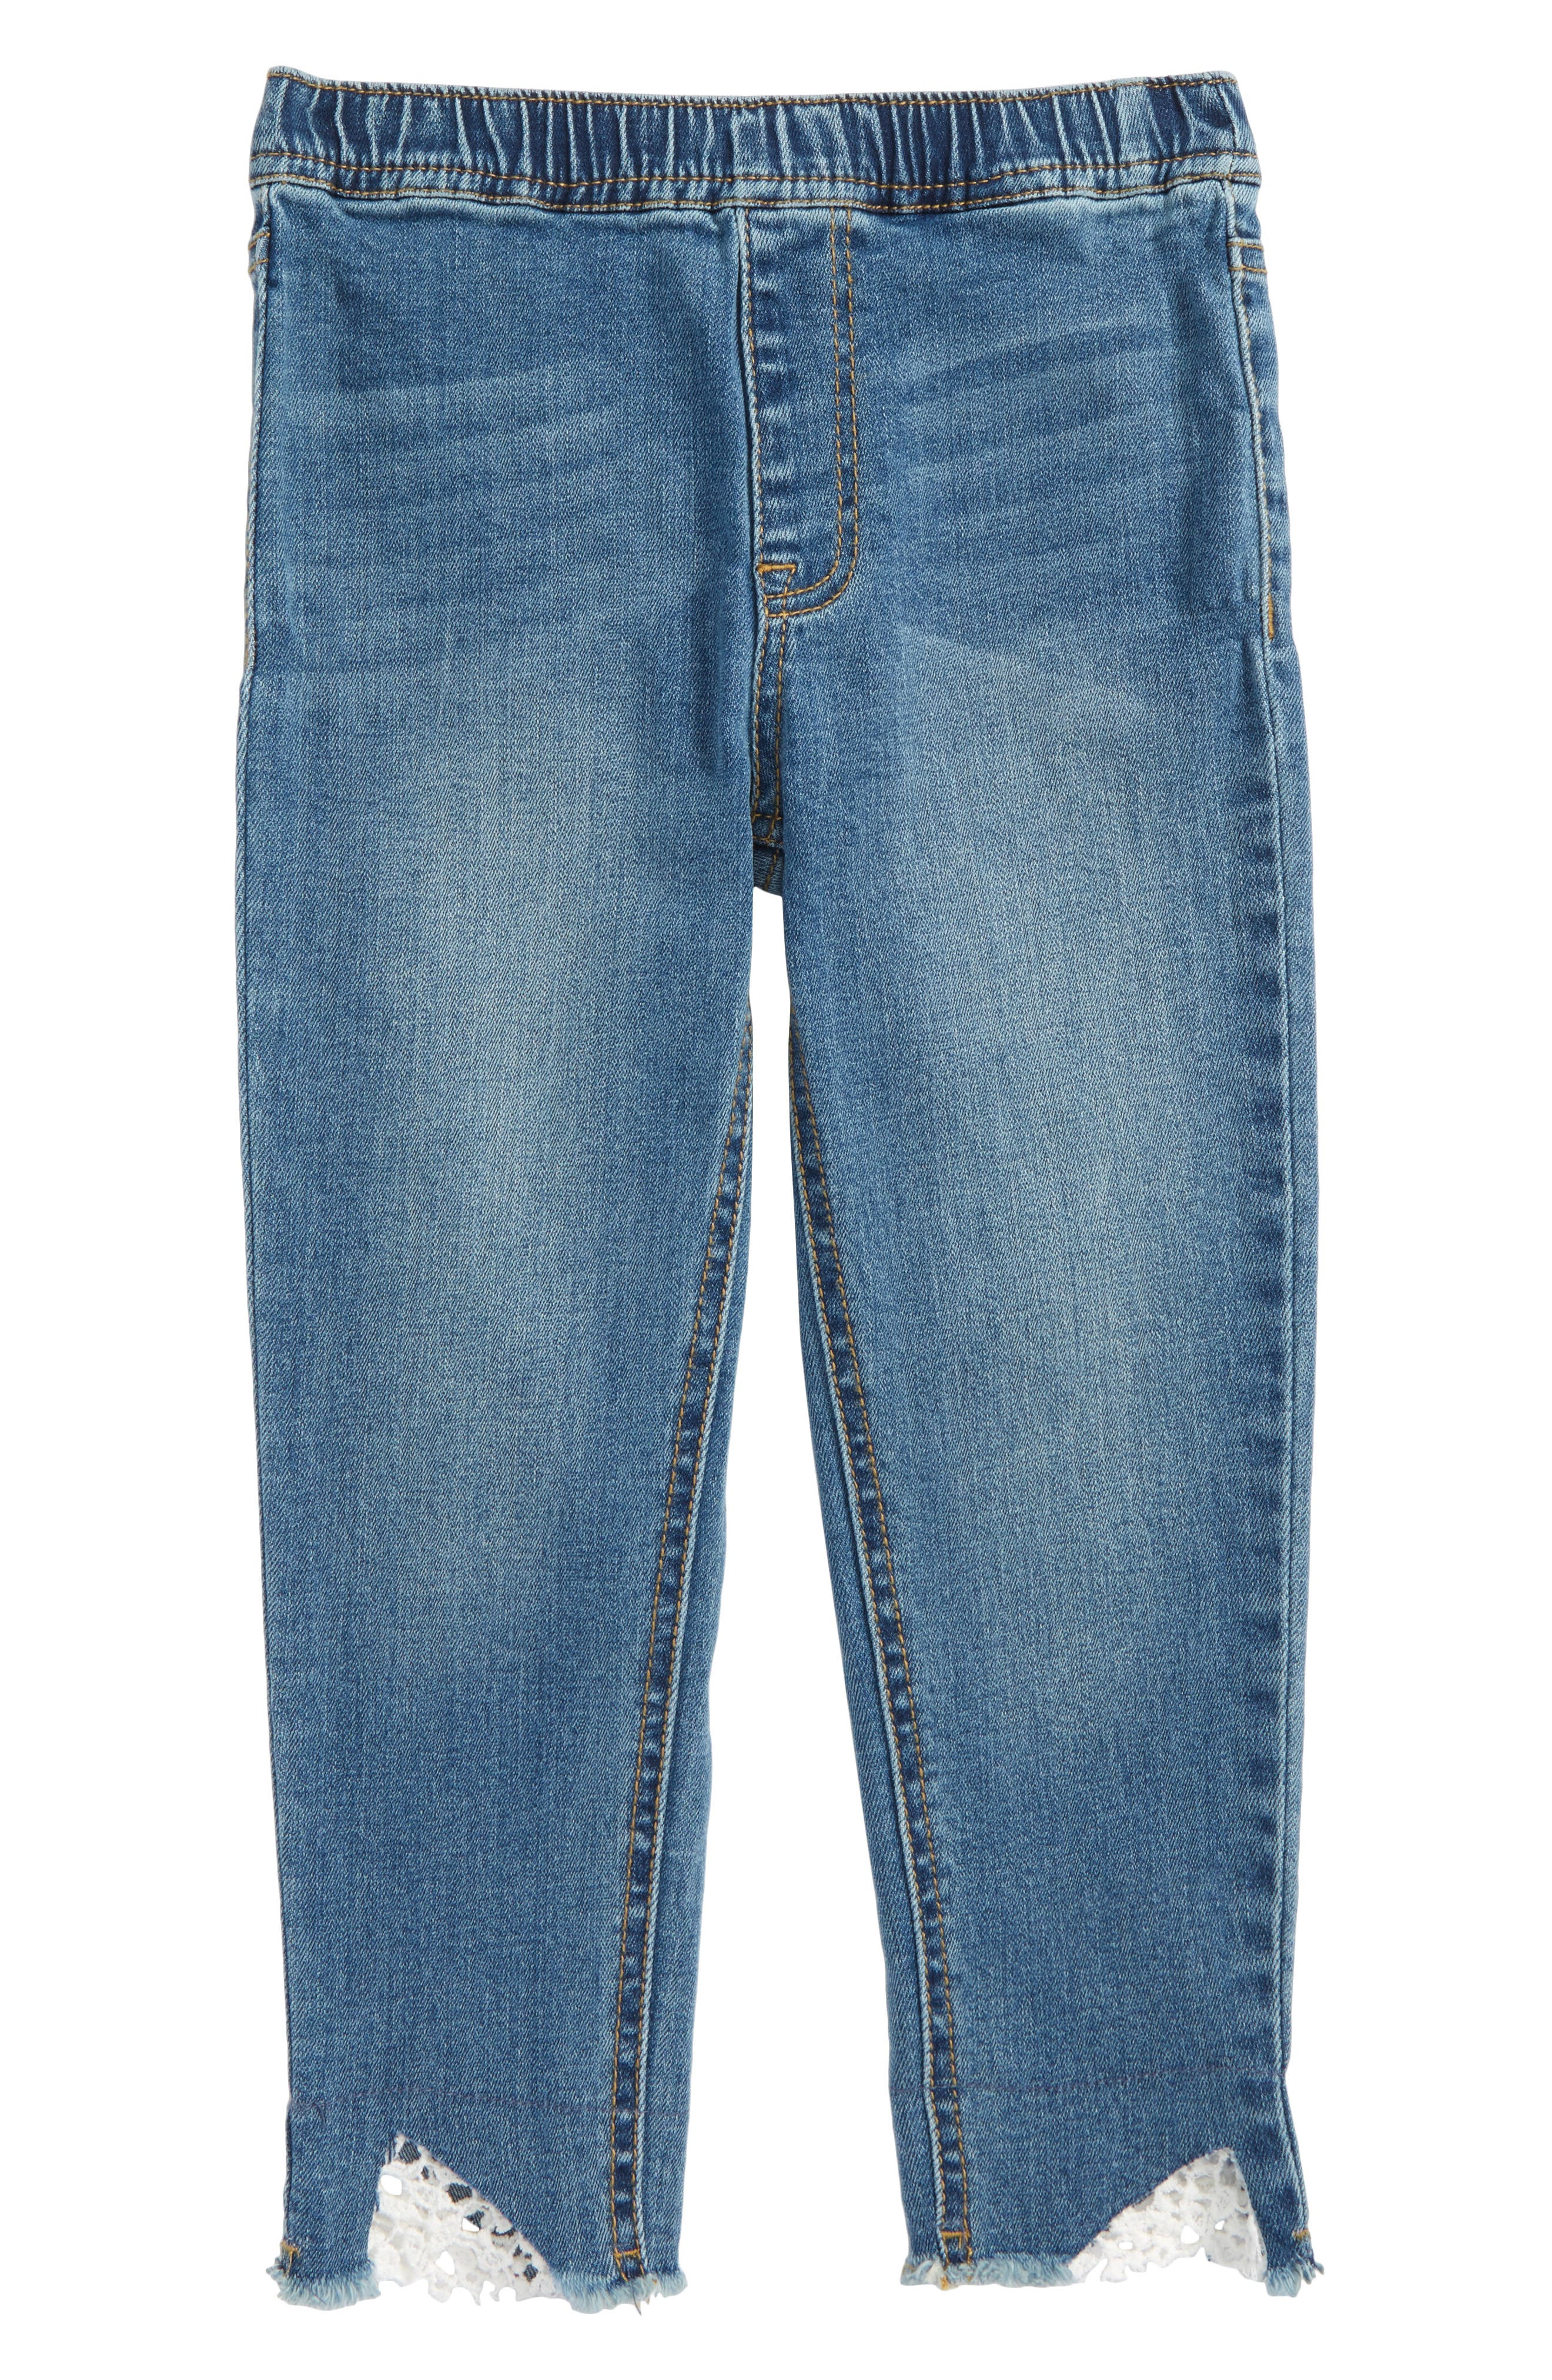 Crop Jeans,                         Main,                         color, Lagoon Wash